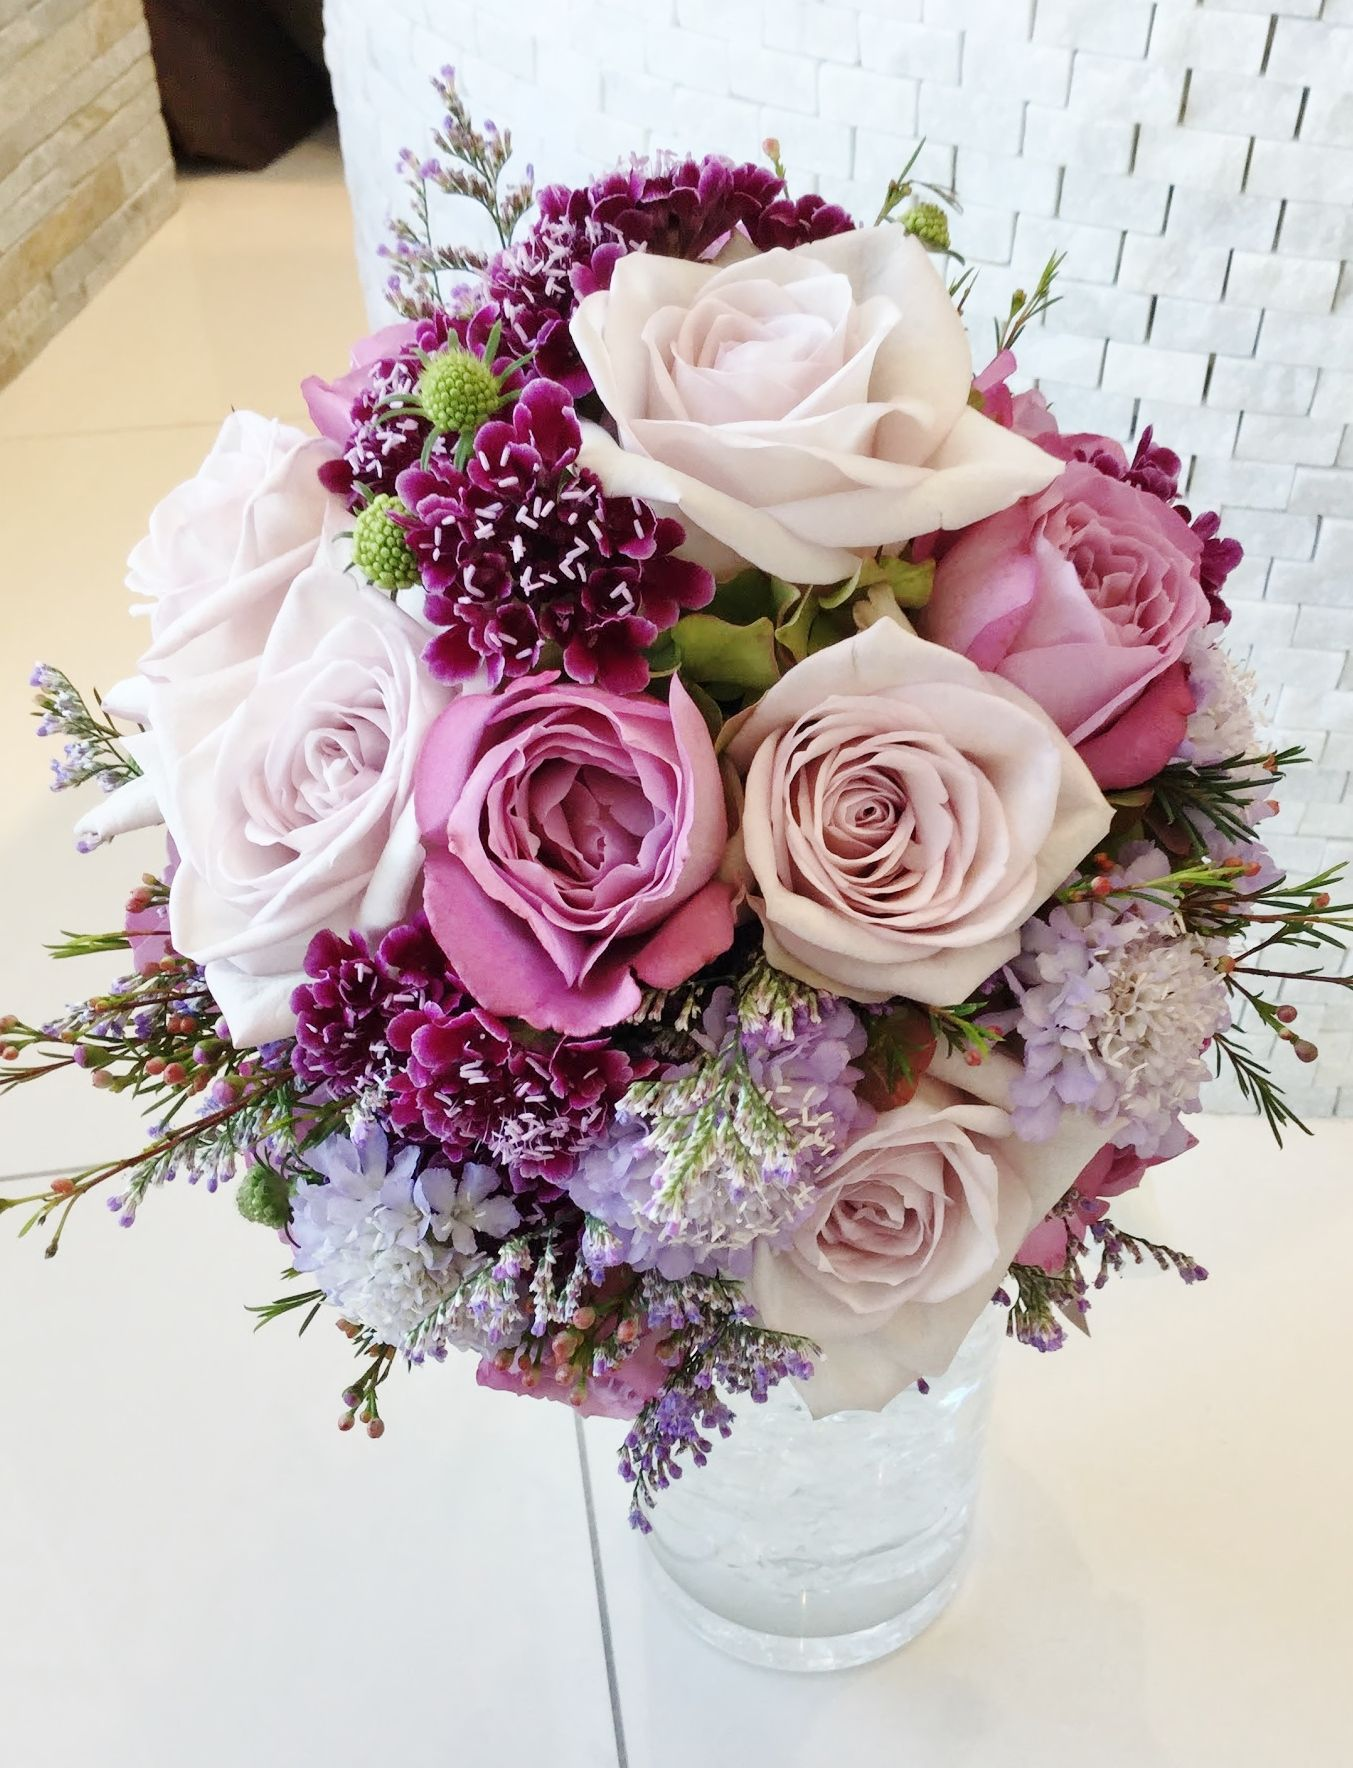 #novarese#VressetRose #Wedding #blue #purple #Bouquet#omiyamonorith #natural #Flower #Bridal #ノバレーゼ#ブレスエットロゼ#大宮モノリス#ウエディング #スカビオサ#バラ #パープル# ブーケ #アジサイ#結婚式